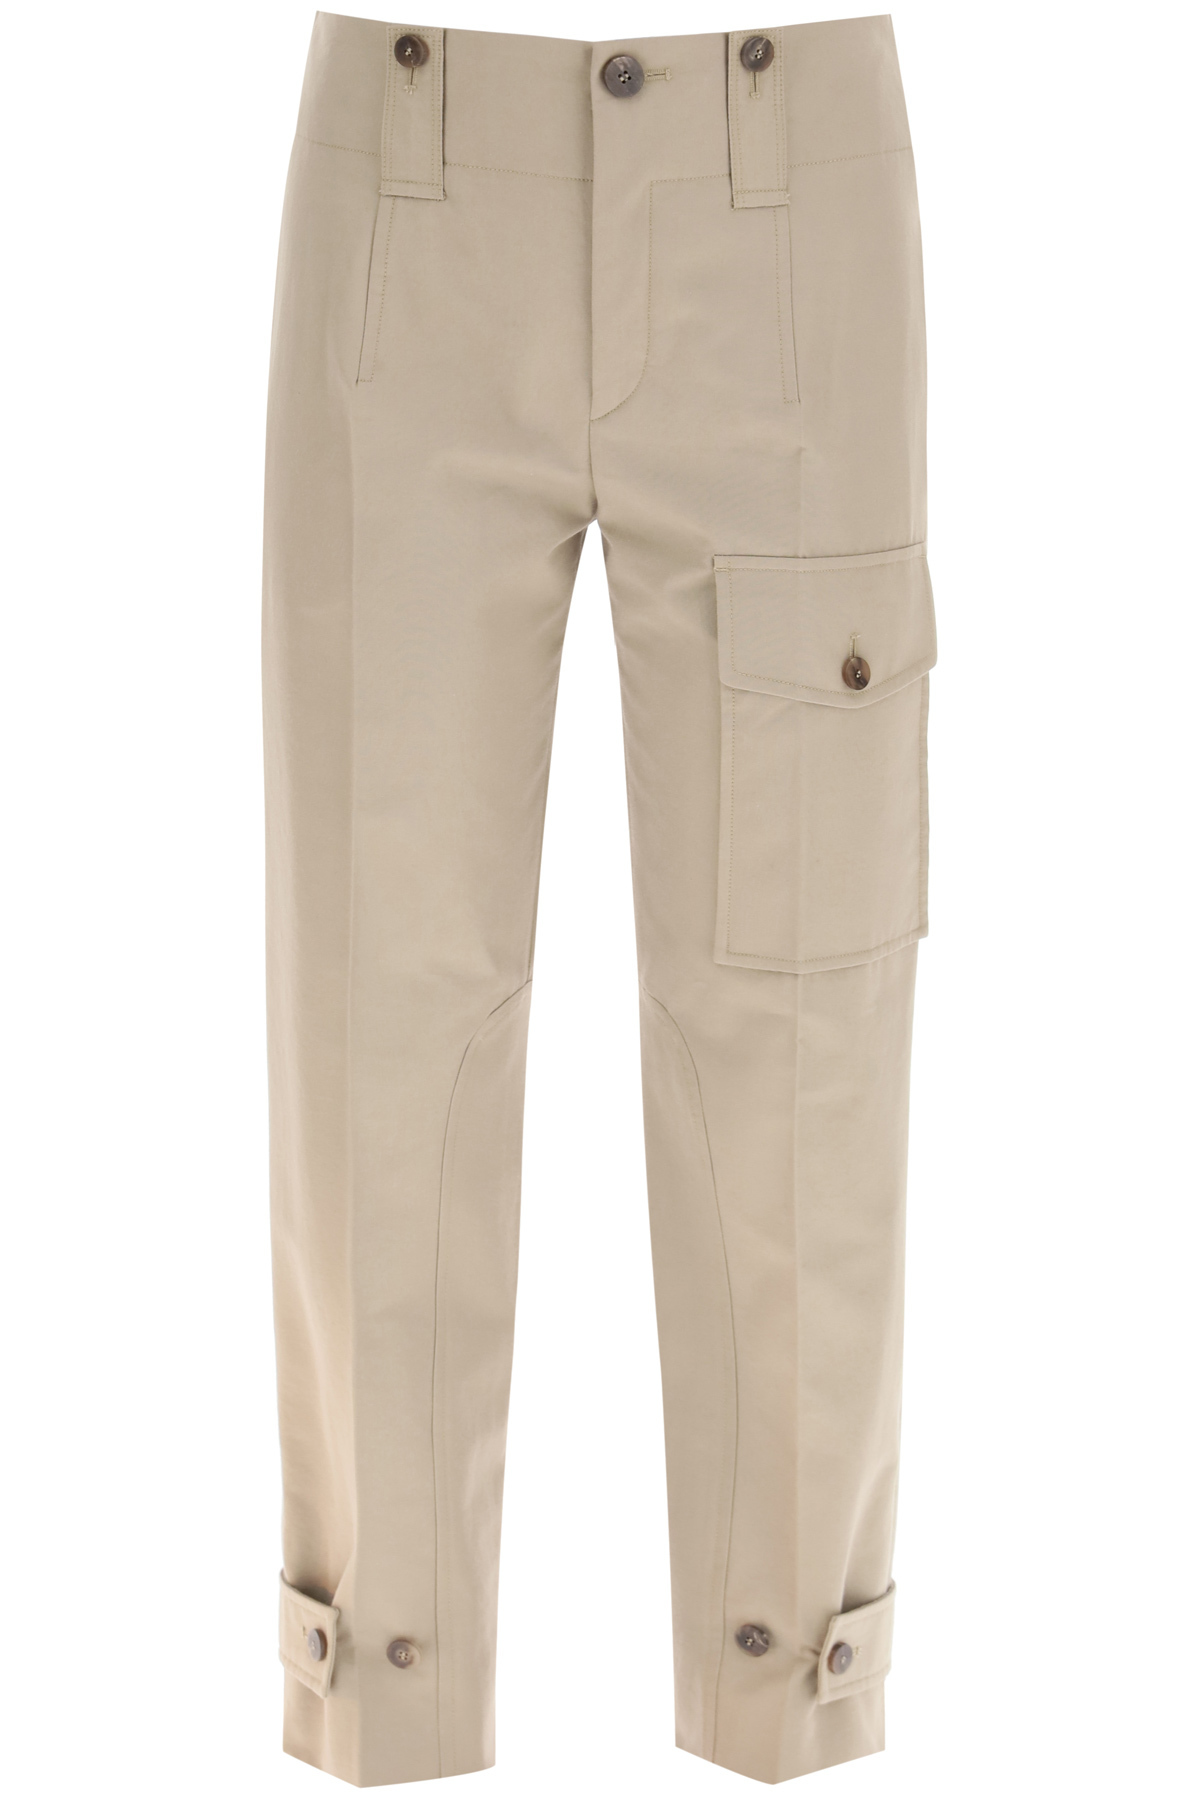 Chloe' pantalone cargo in cotone